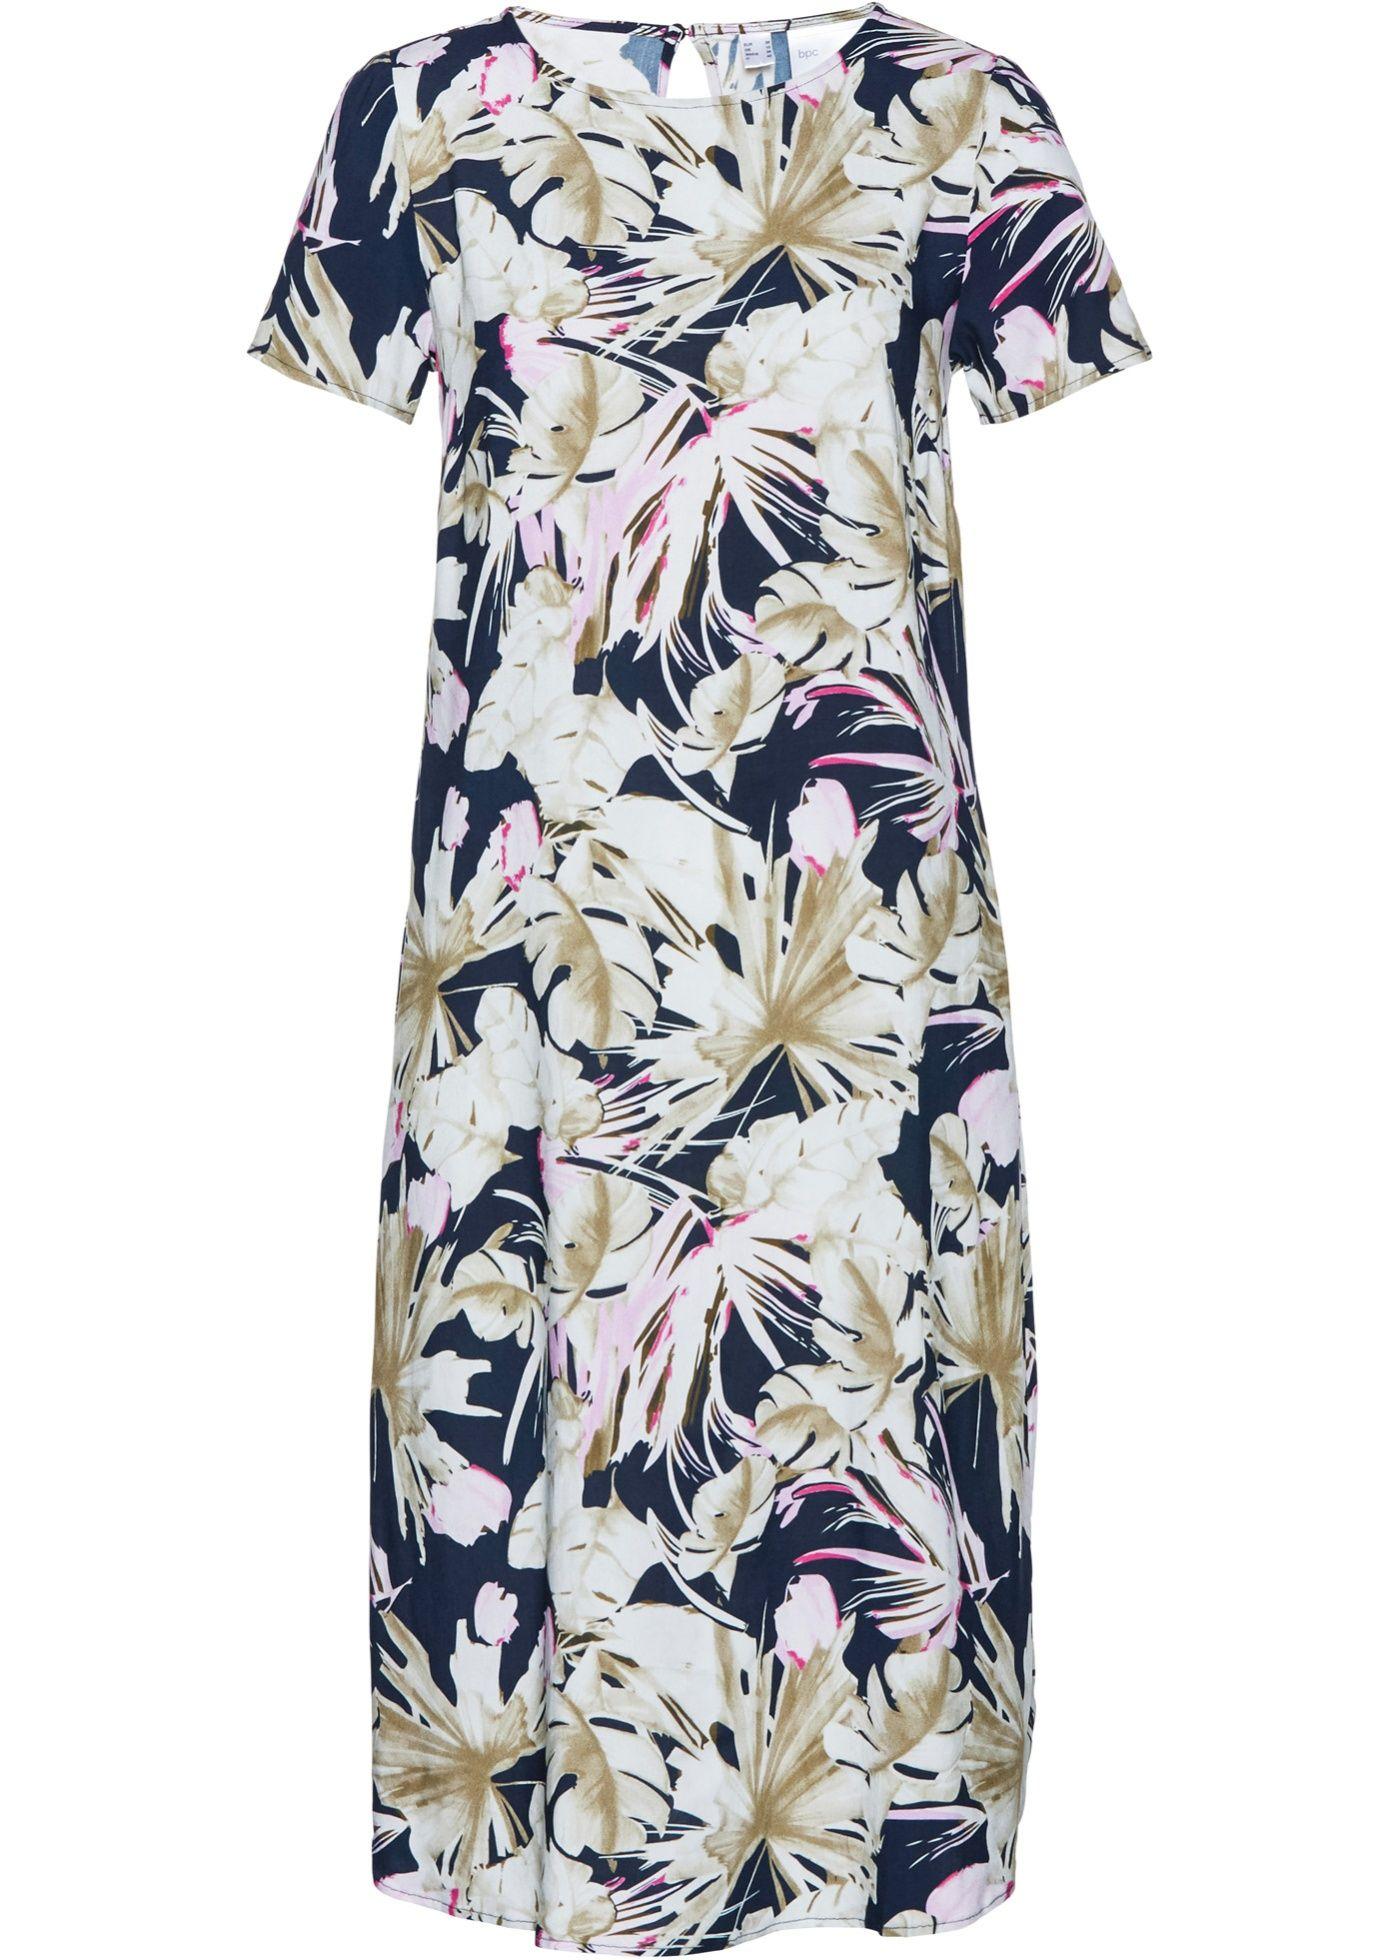 Šaty s potiskem | Kleider, Modestil, Kleid mit ärmel